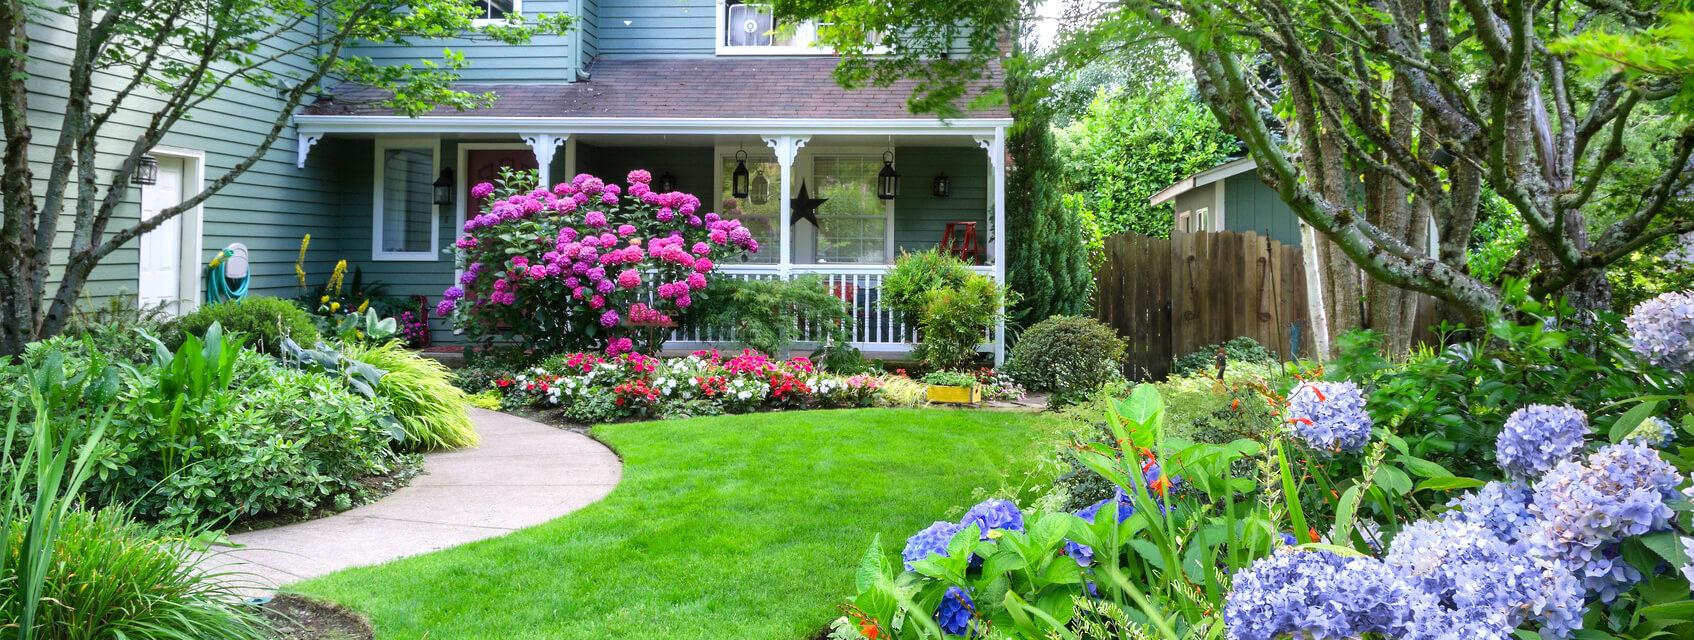 Gainesville Landscape Amp Lawn Care Evergreen Lawn Care